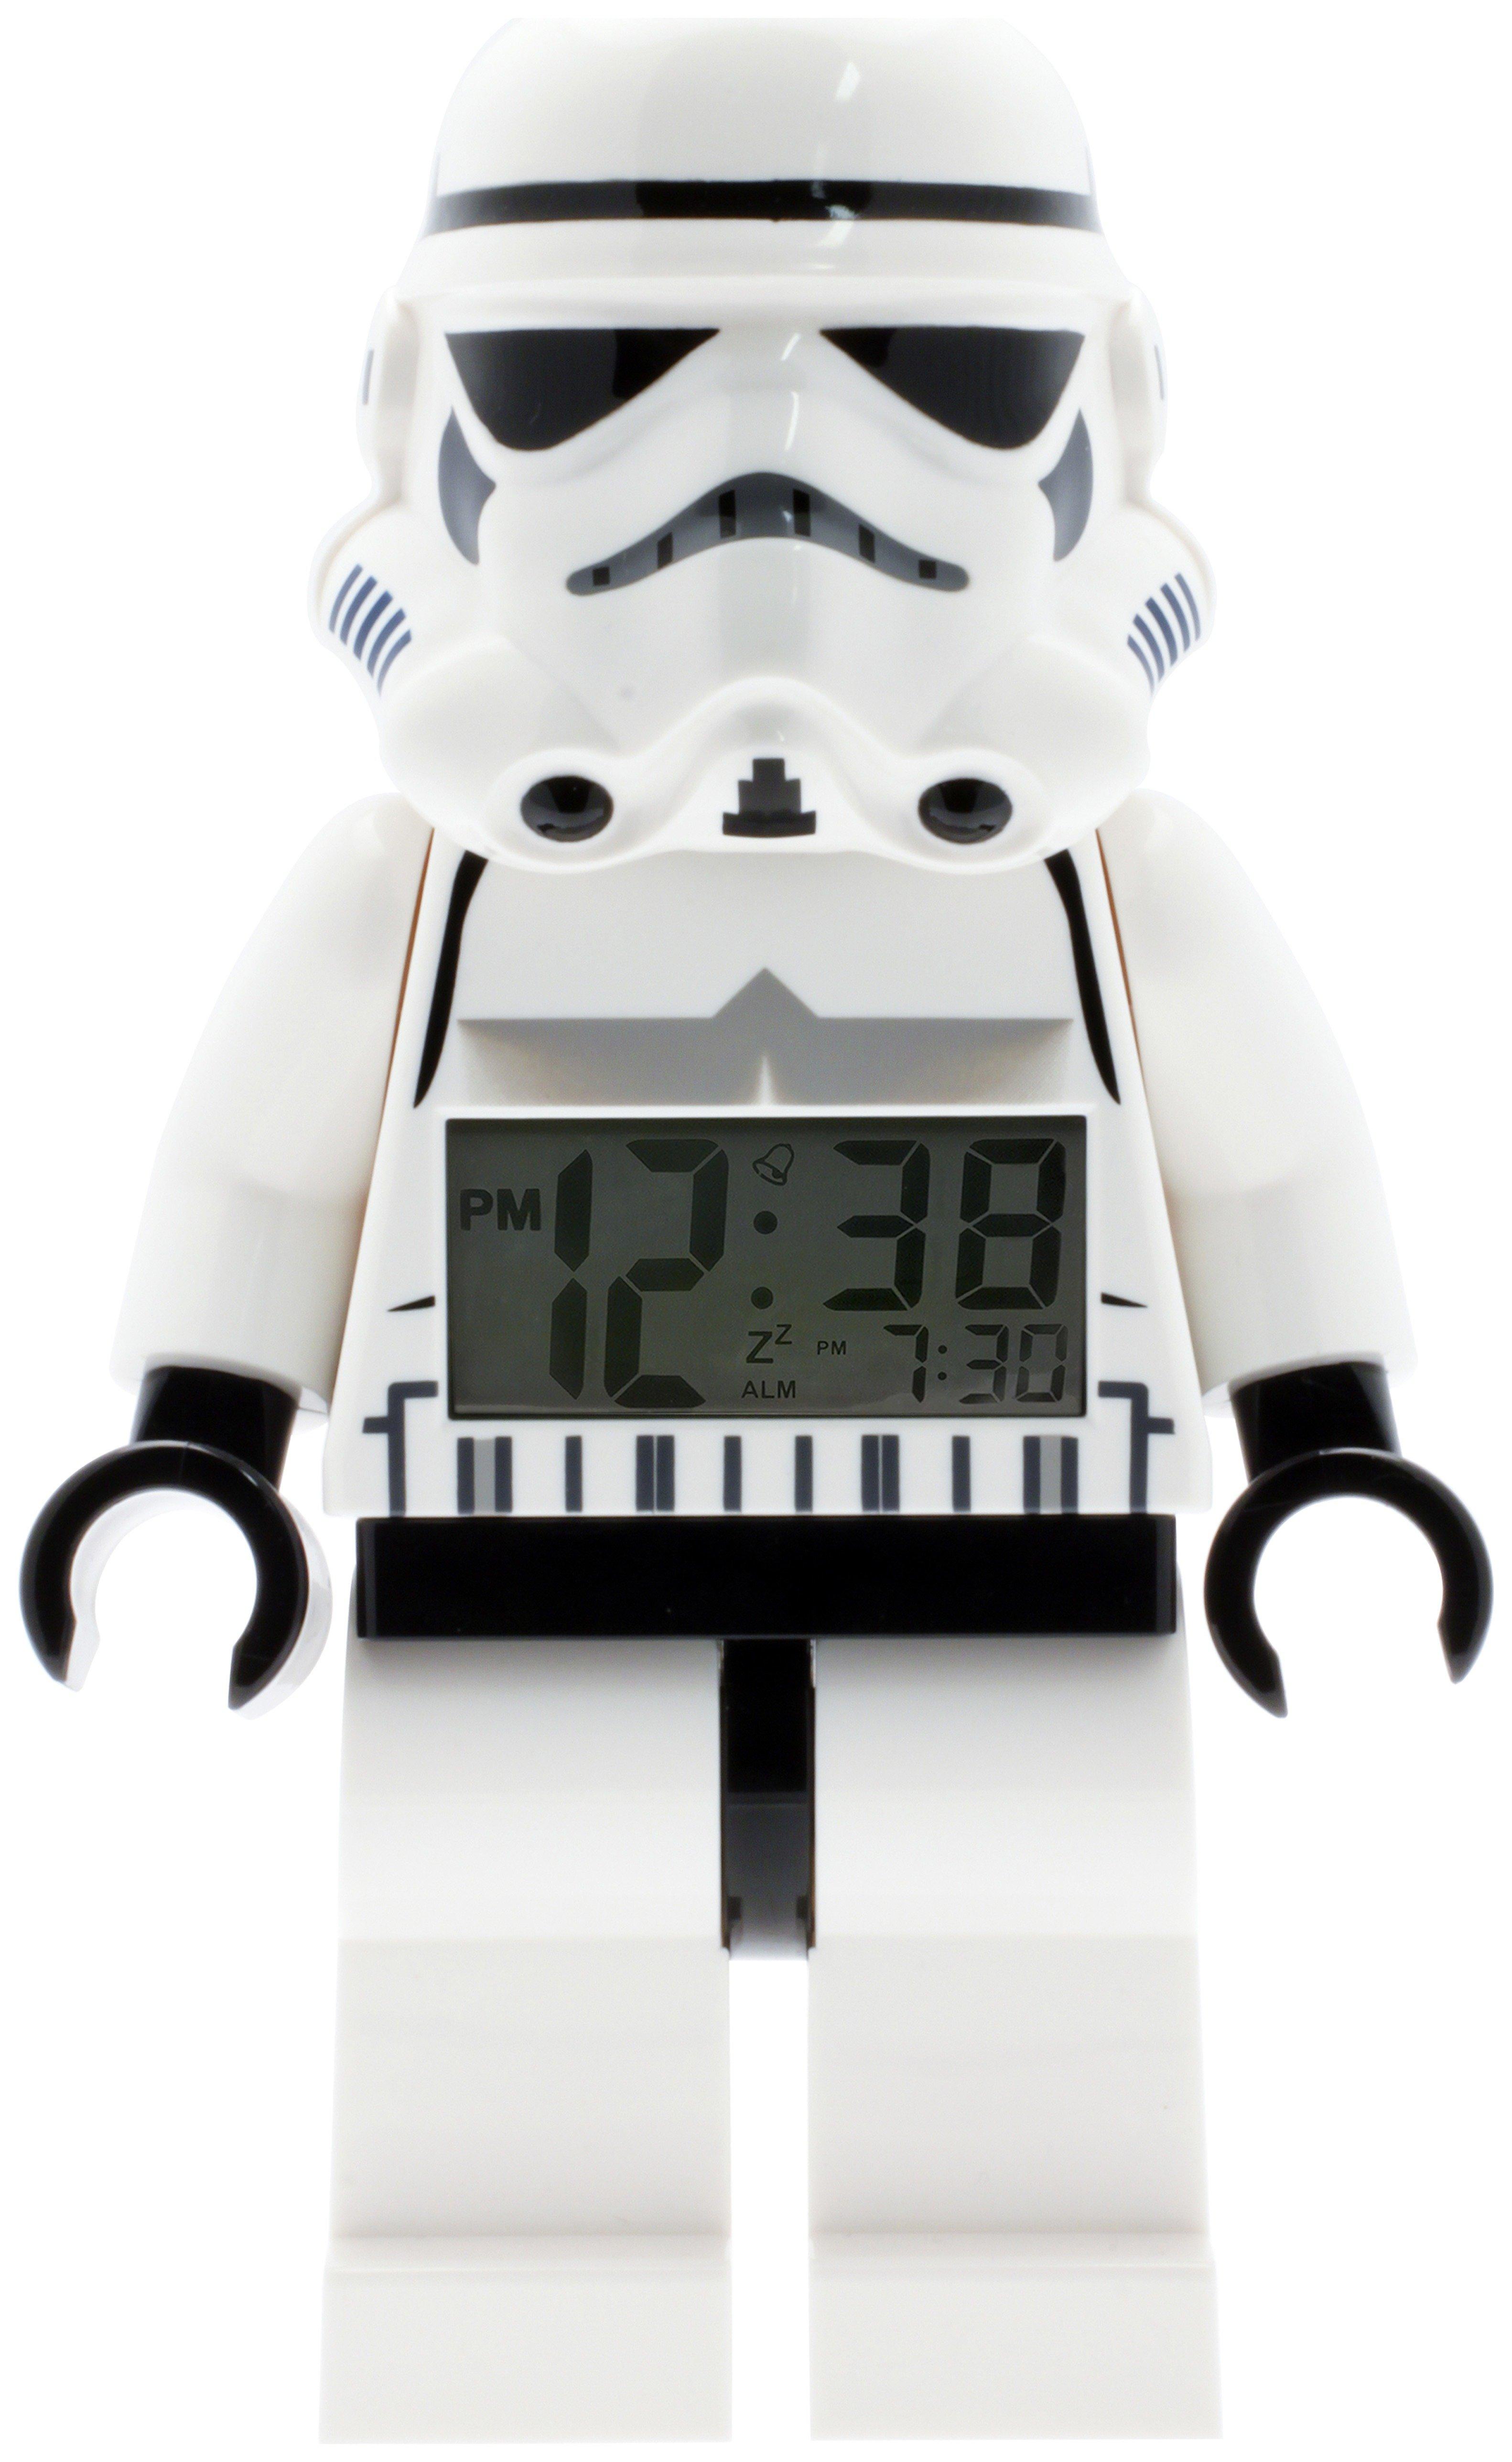 LEGO Star Wars Stormtrooper Minifigure Alarm Clock